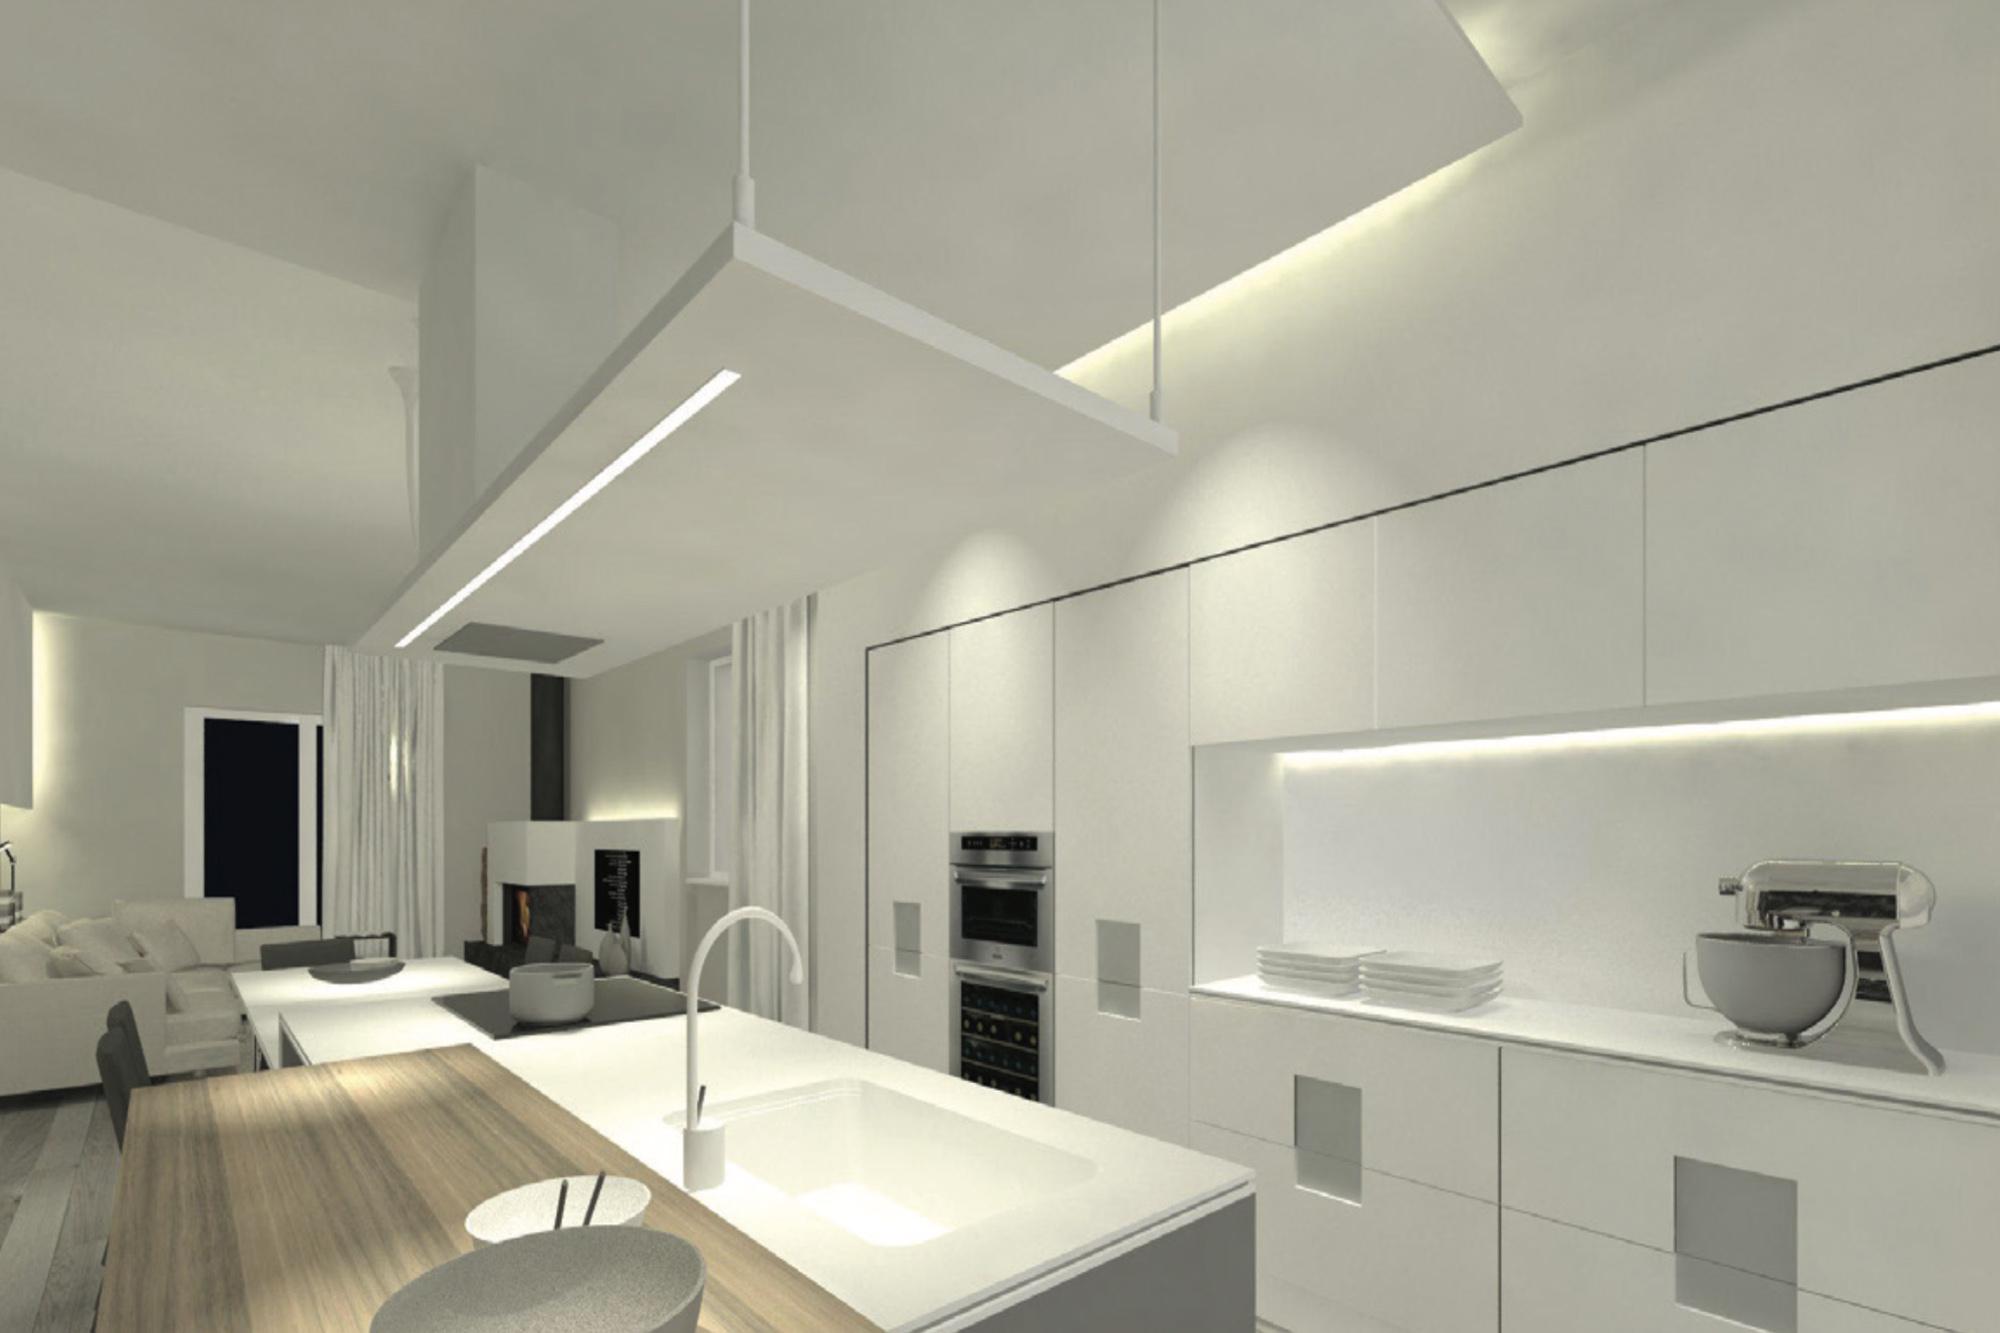 2 meter led profil pu stuckleiste f r indirekte. Black Bedroom Furniture Sets. Home Design Ideas